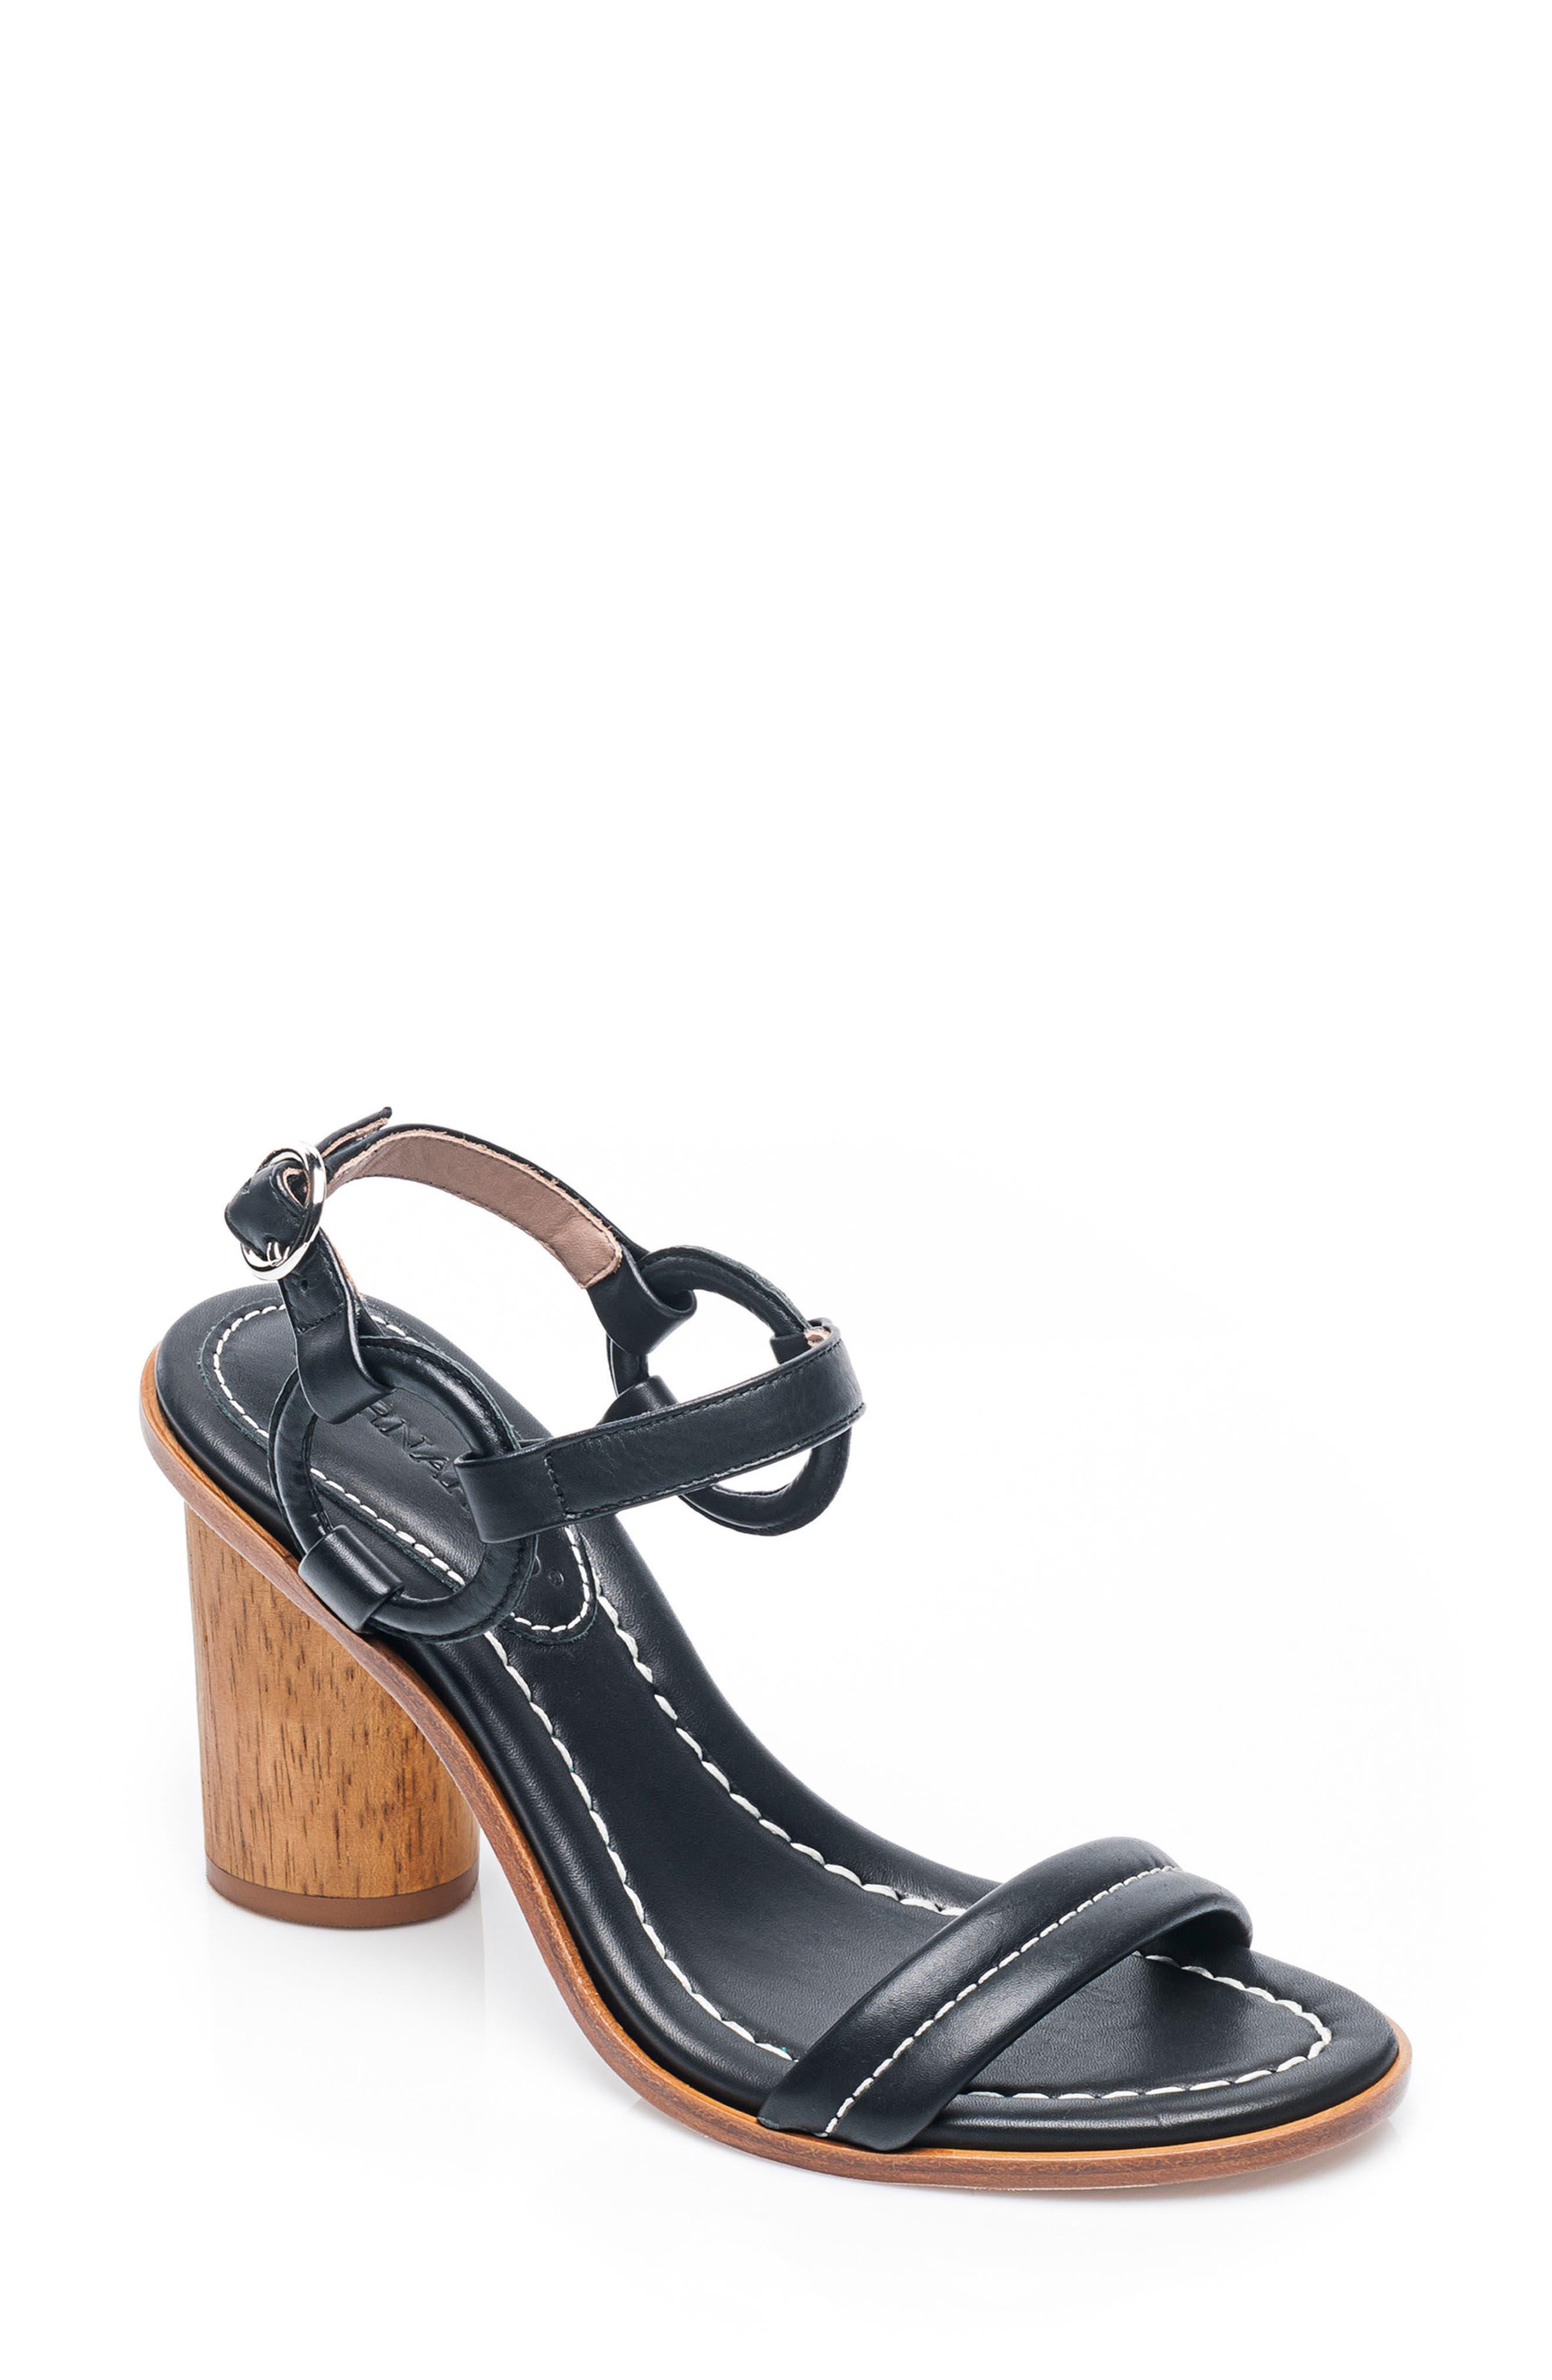 Bernardo Harlow Ankle Strap Sandal- Black